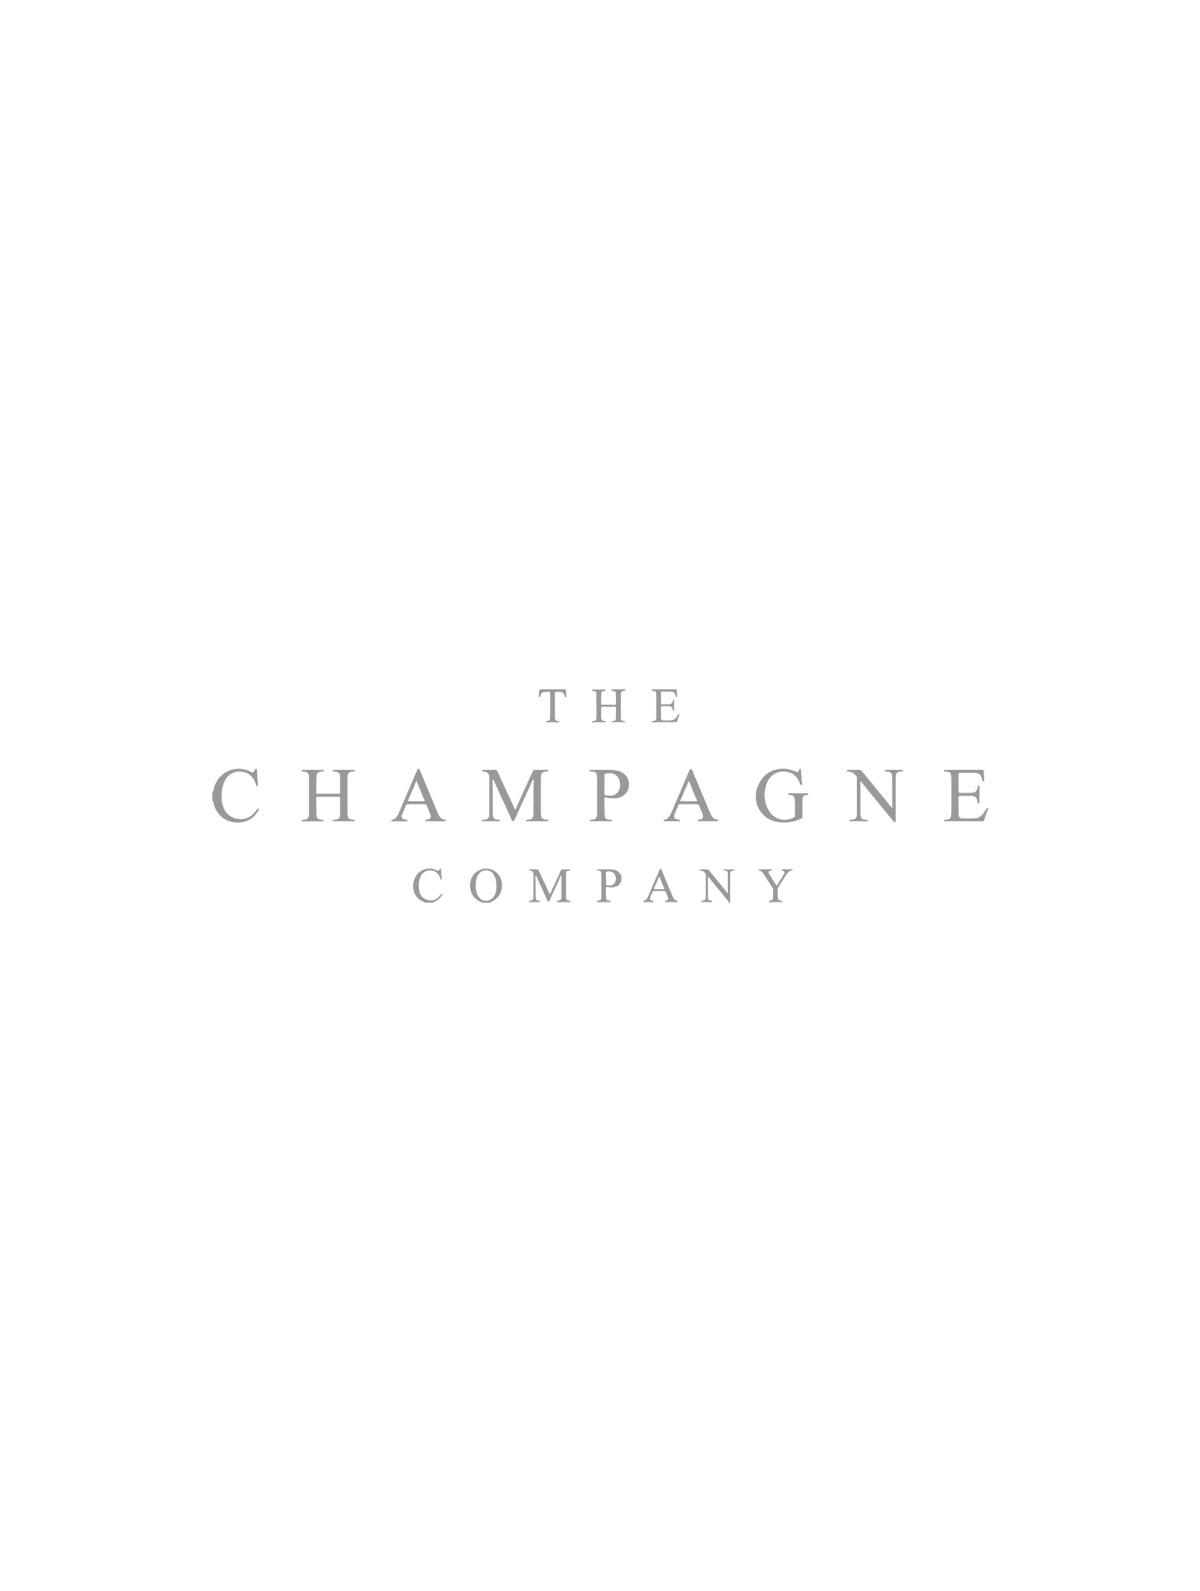 Moet & Chandon Brut Champagne Party Case Deal 6x75cl & Moet Ice Bucket